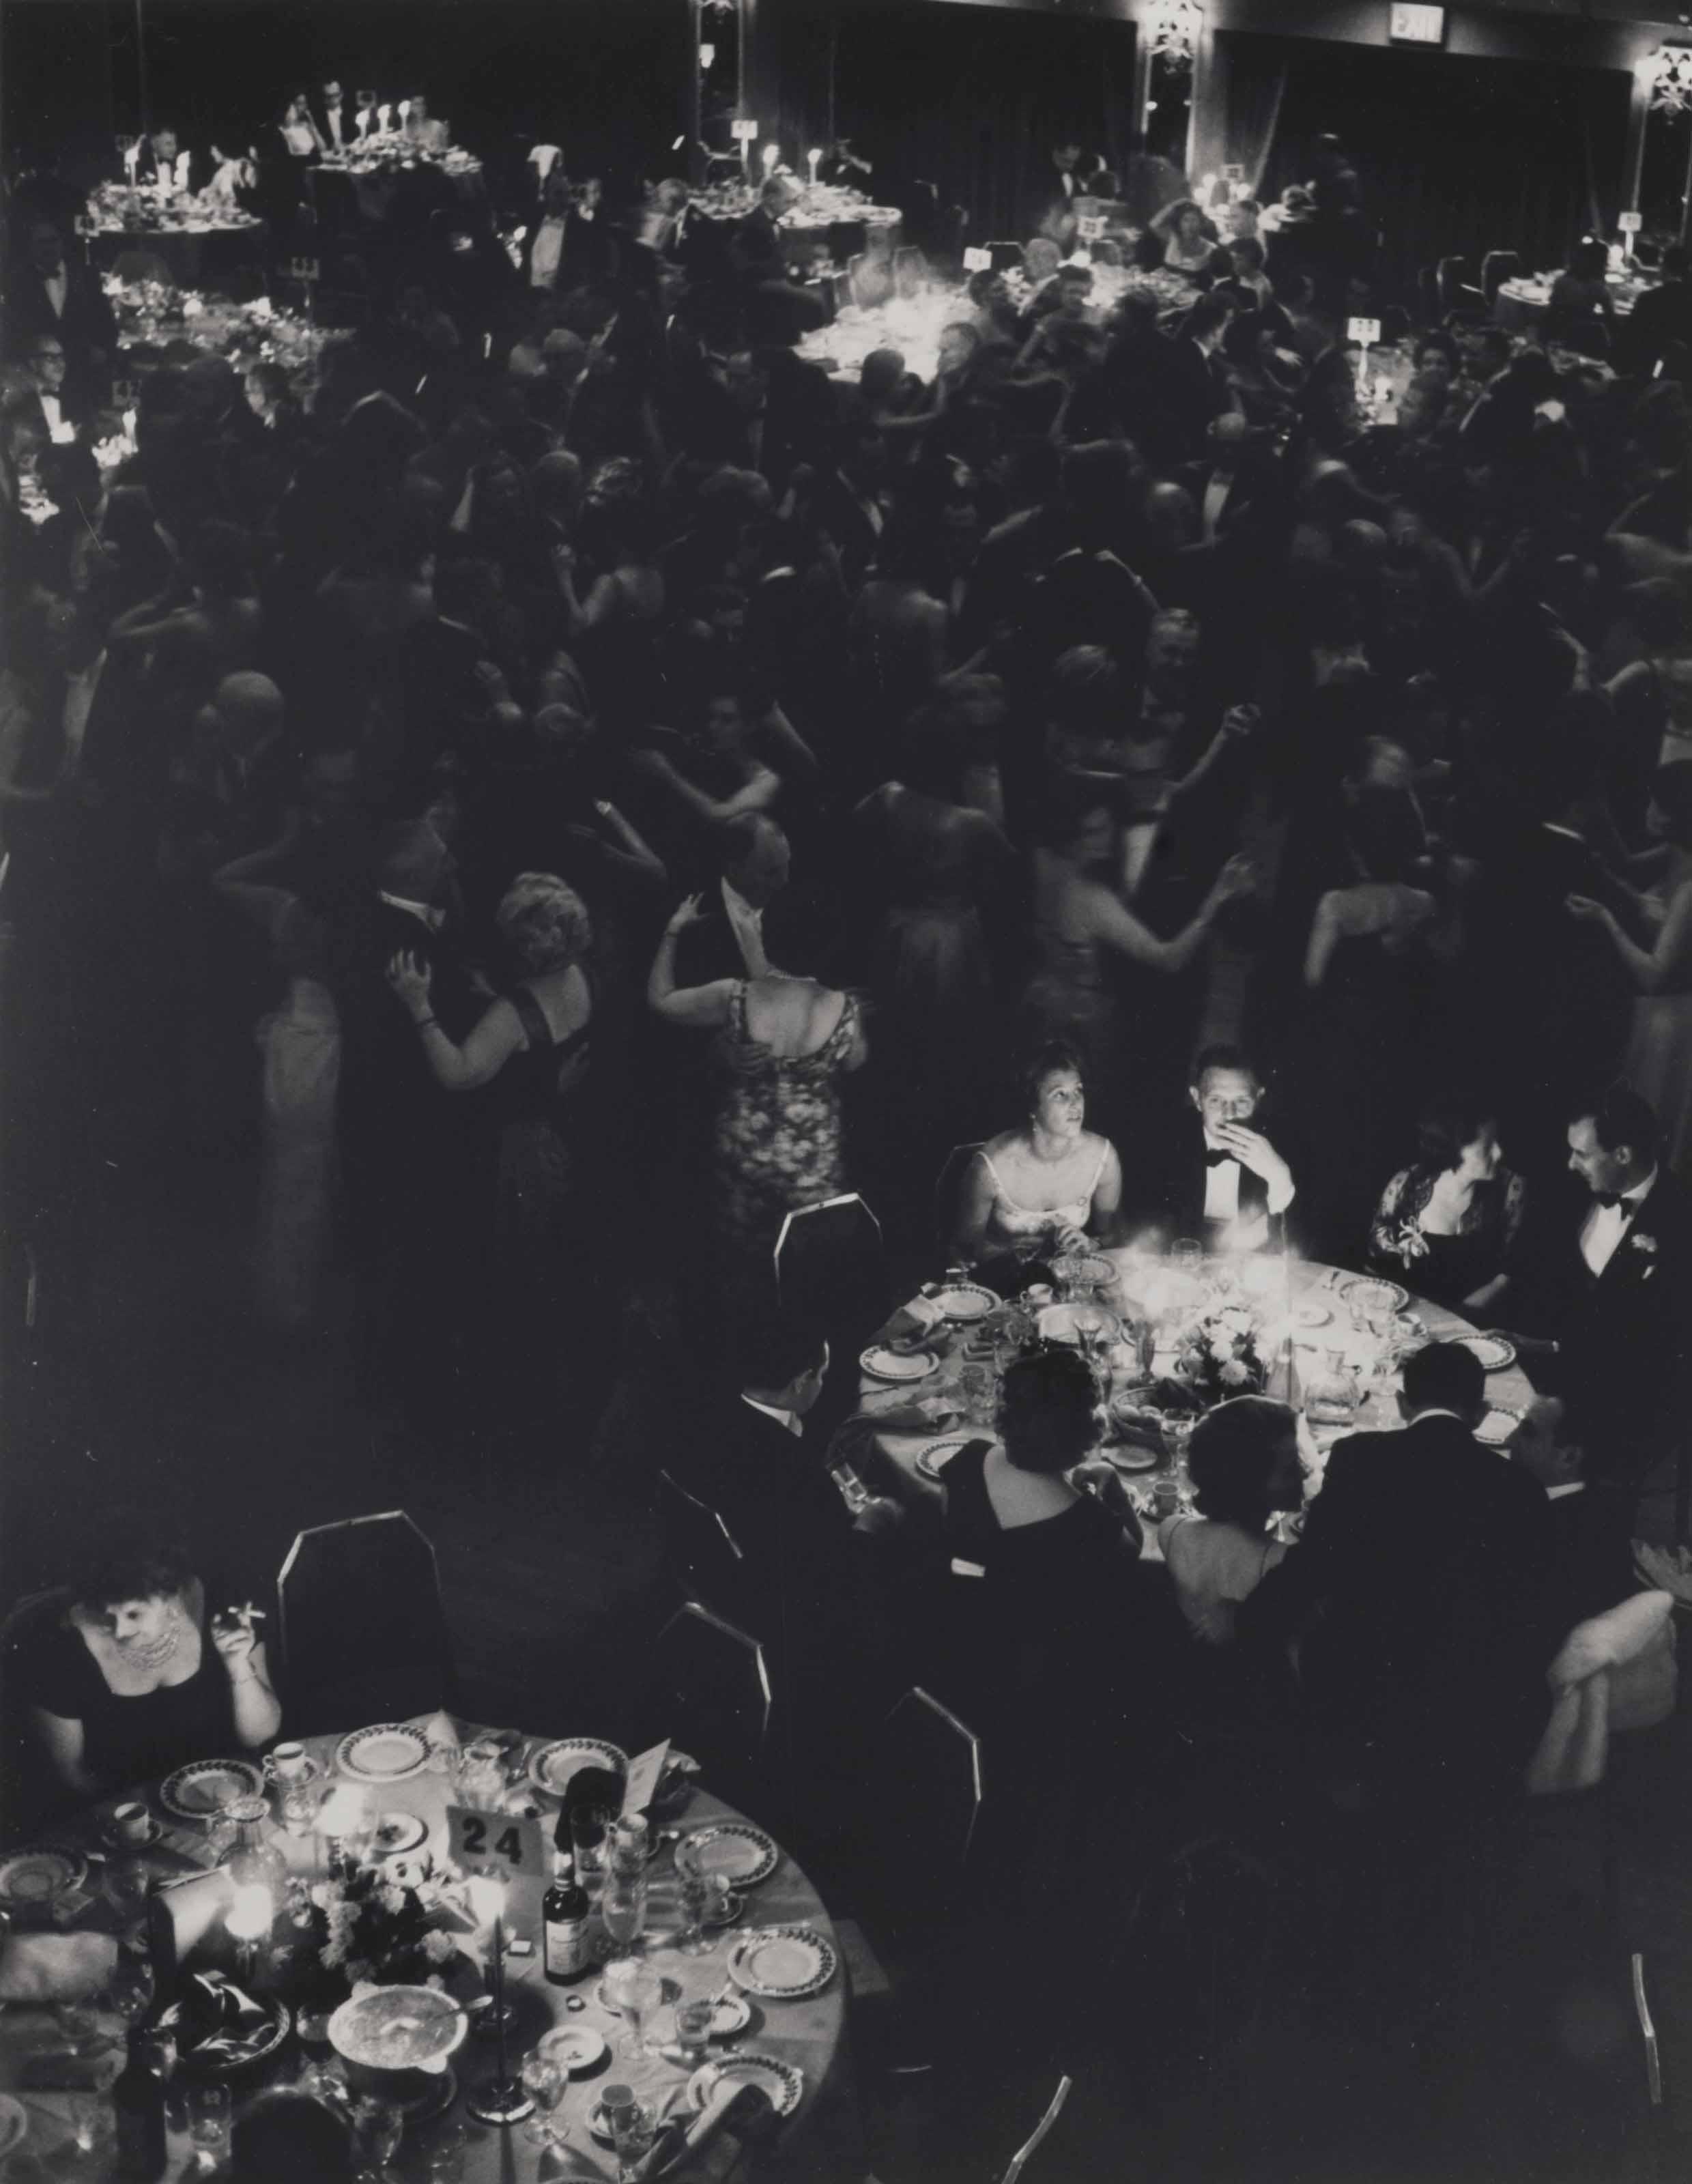 Andreas Feininger (1906–1999)